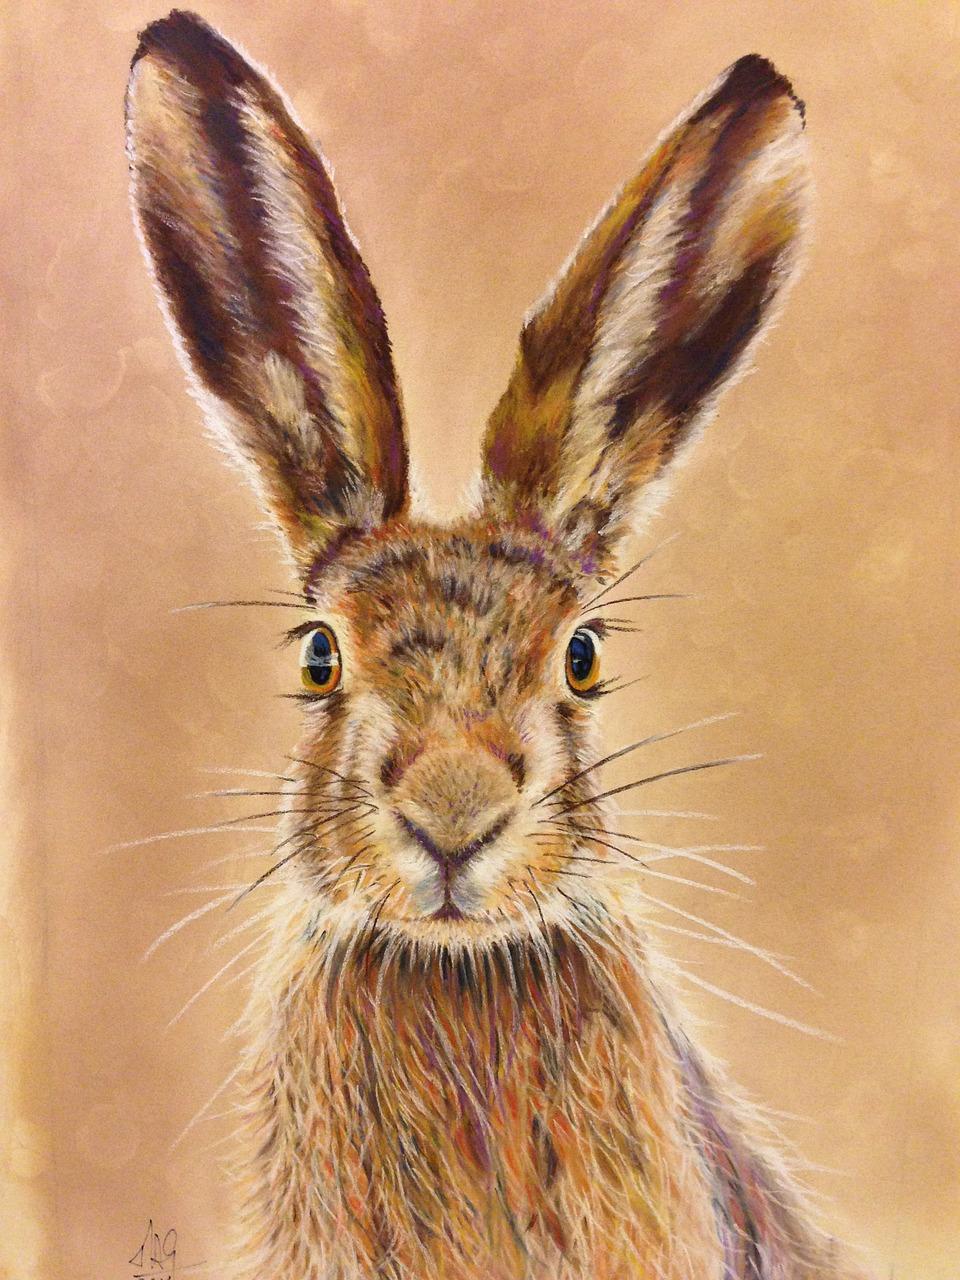 Картинки с изображениями зайцев